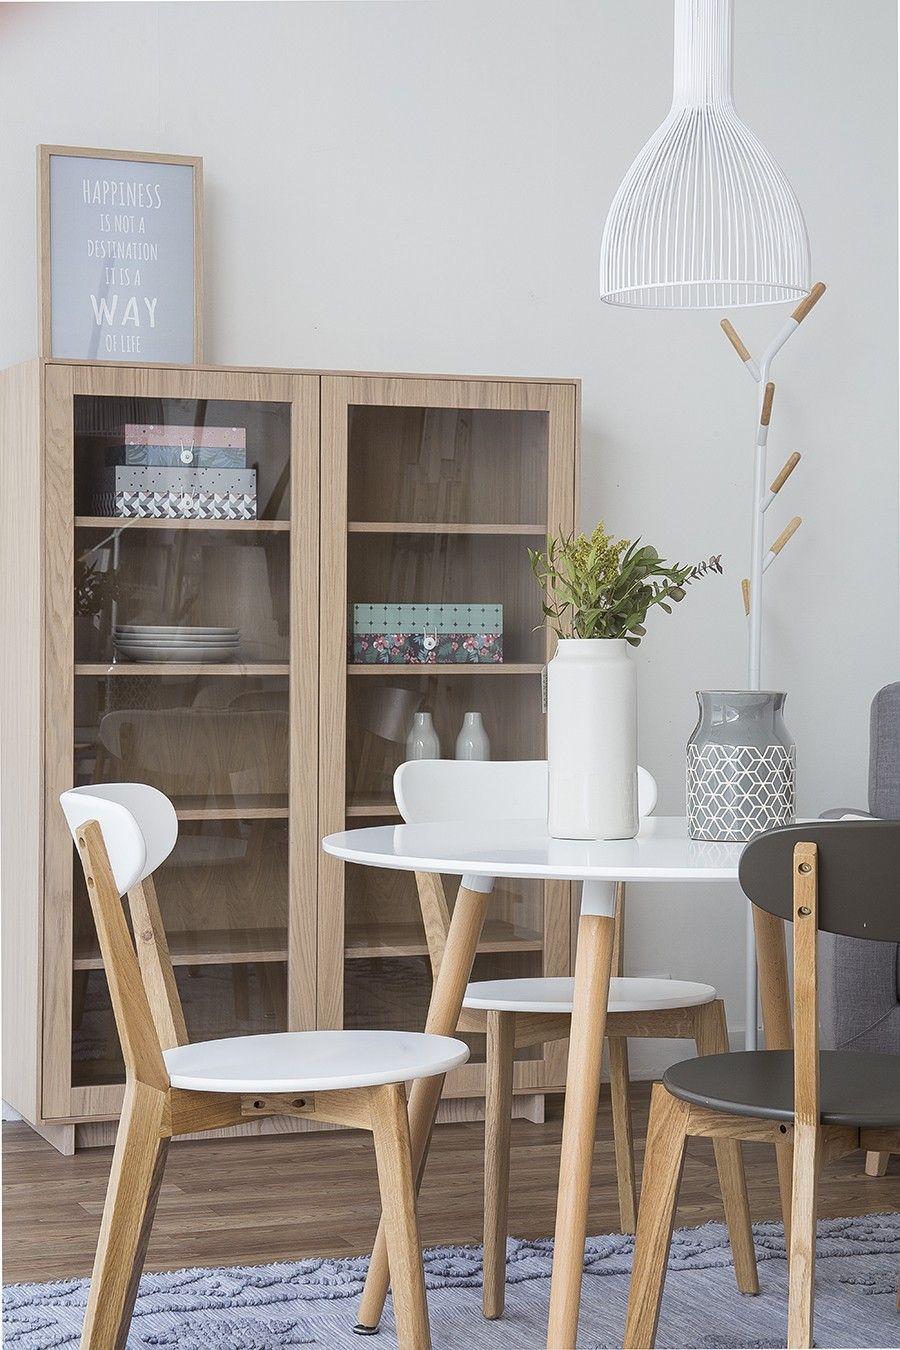 Slow mesa de comedor cocina redonda cocina pinterest for Mesas y sillas para comedor pequeno